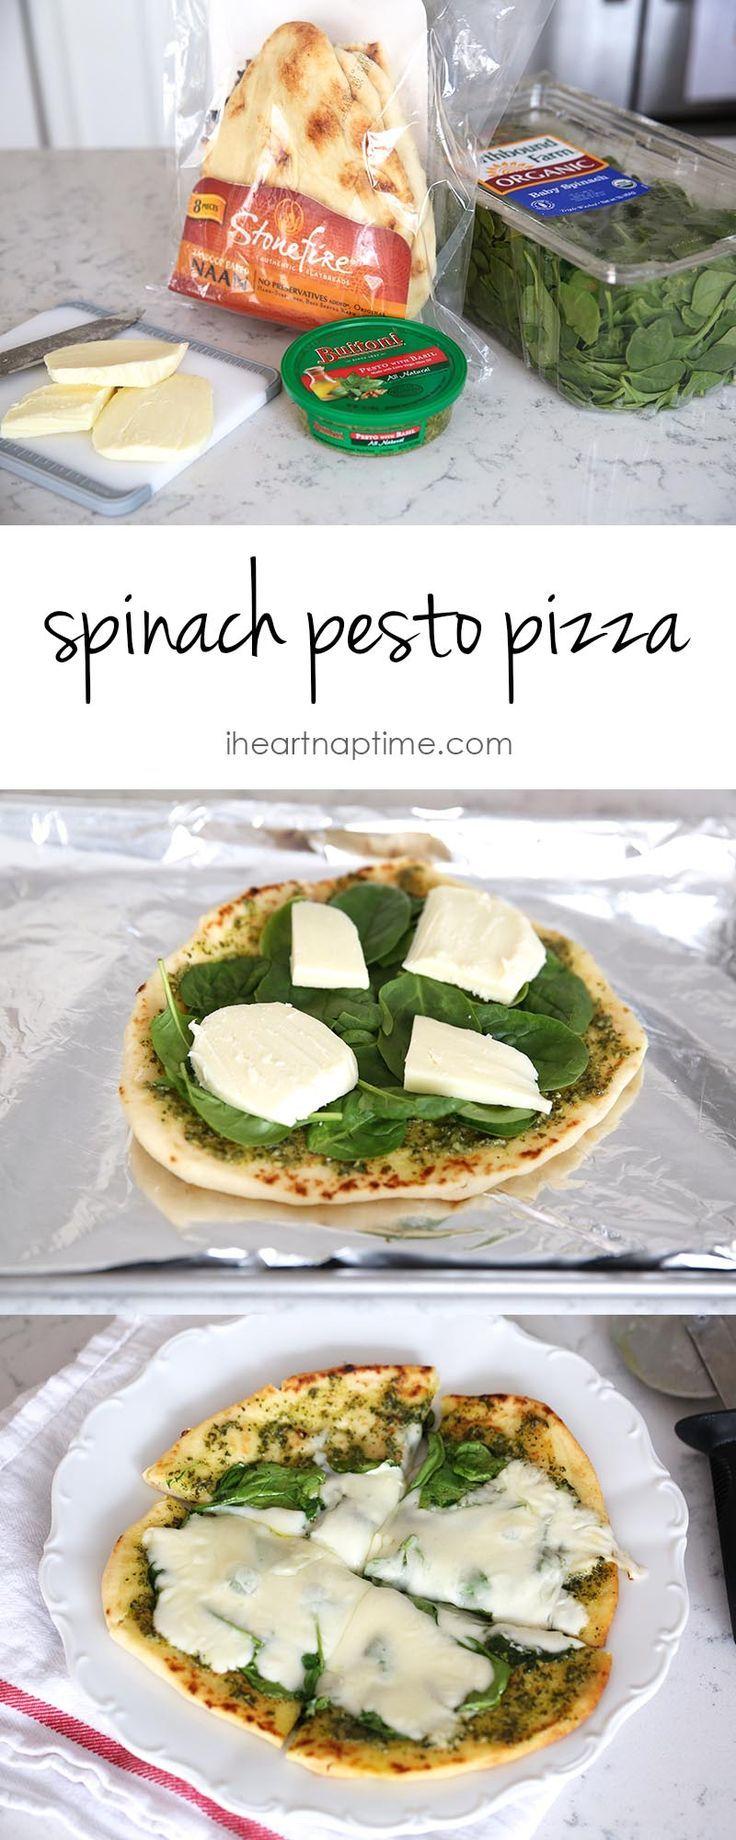 sorprende a tus colegas con ésta pizza